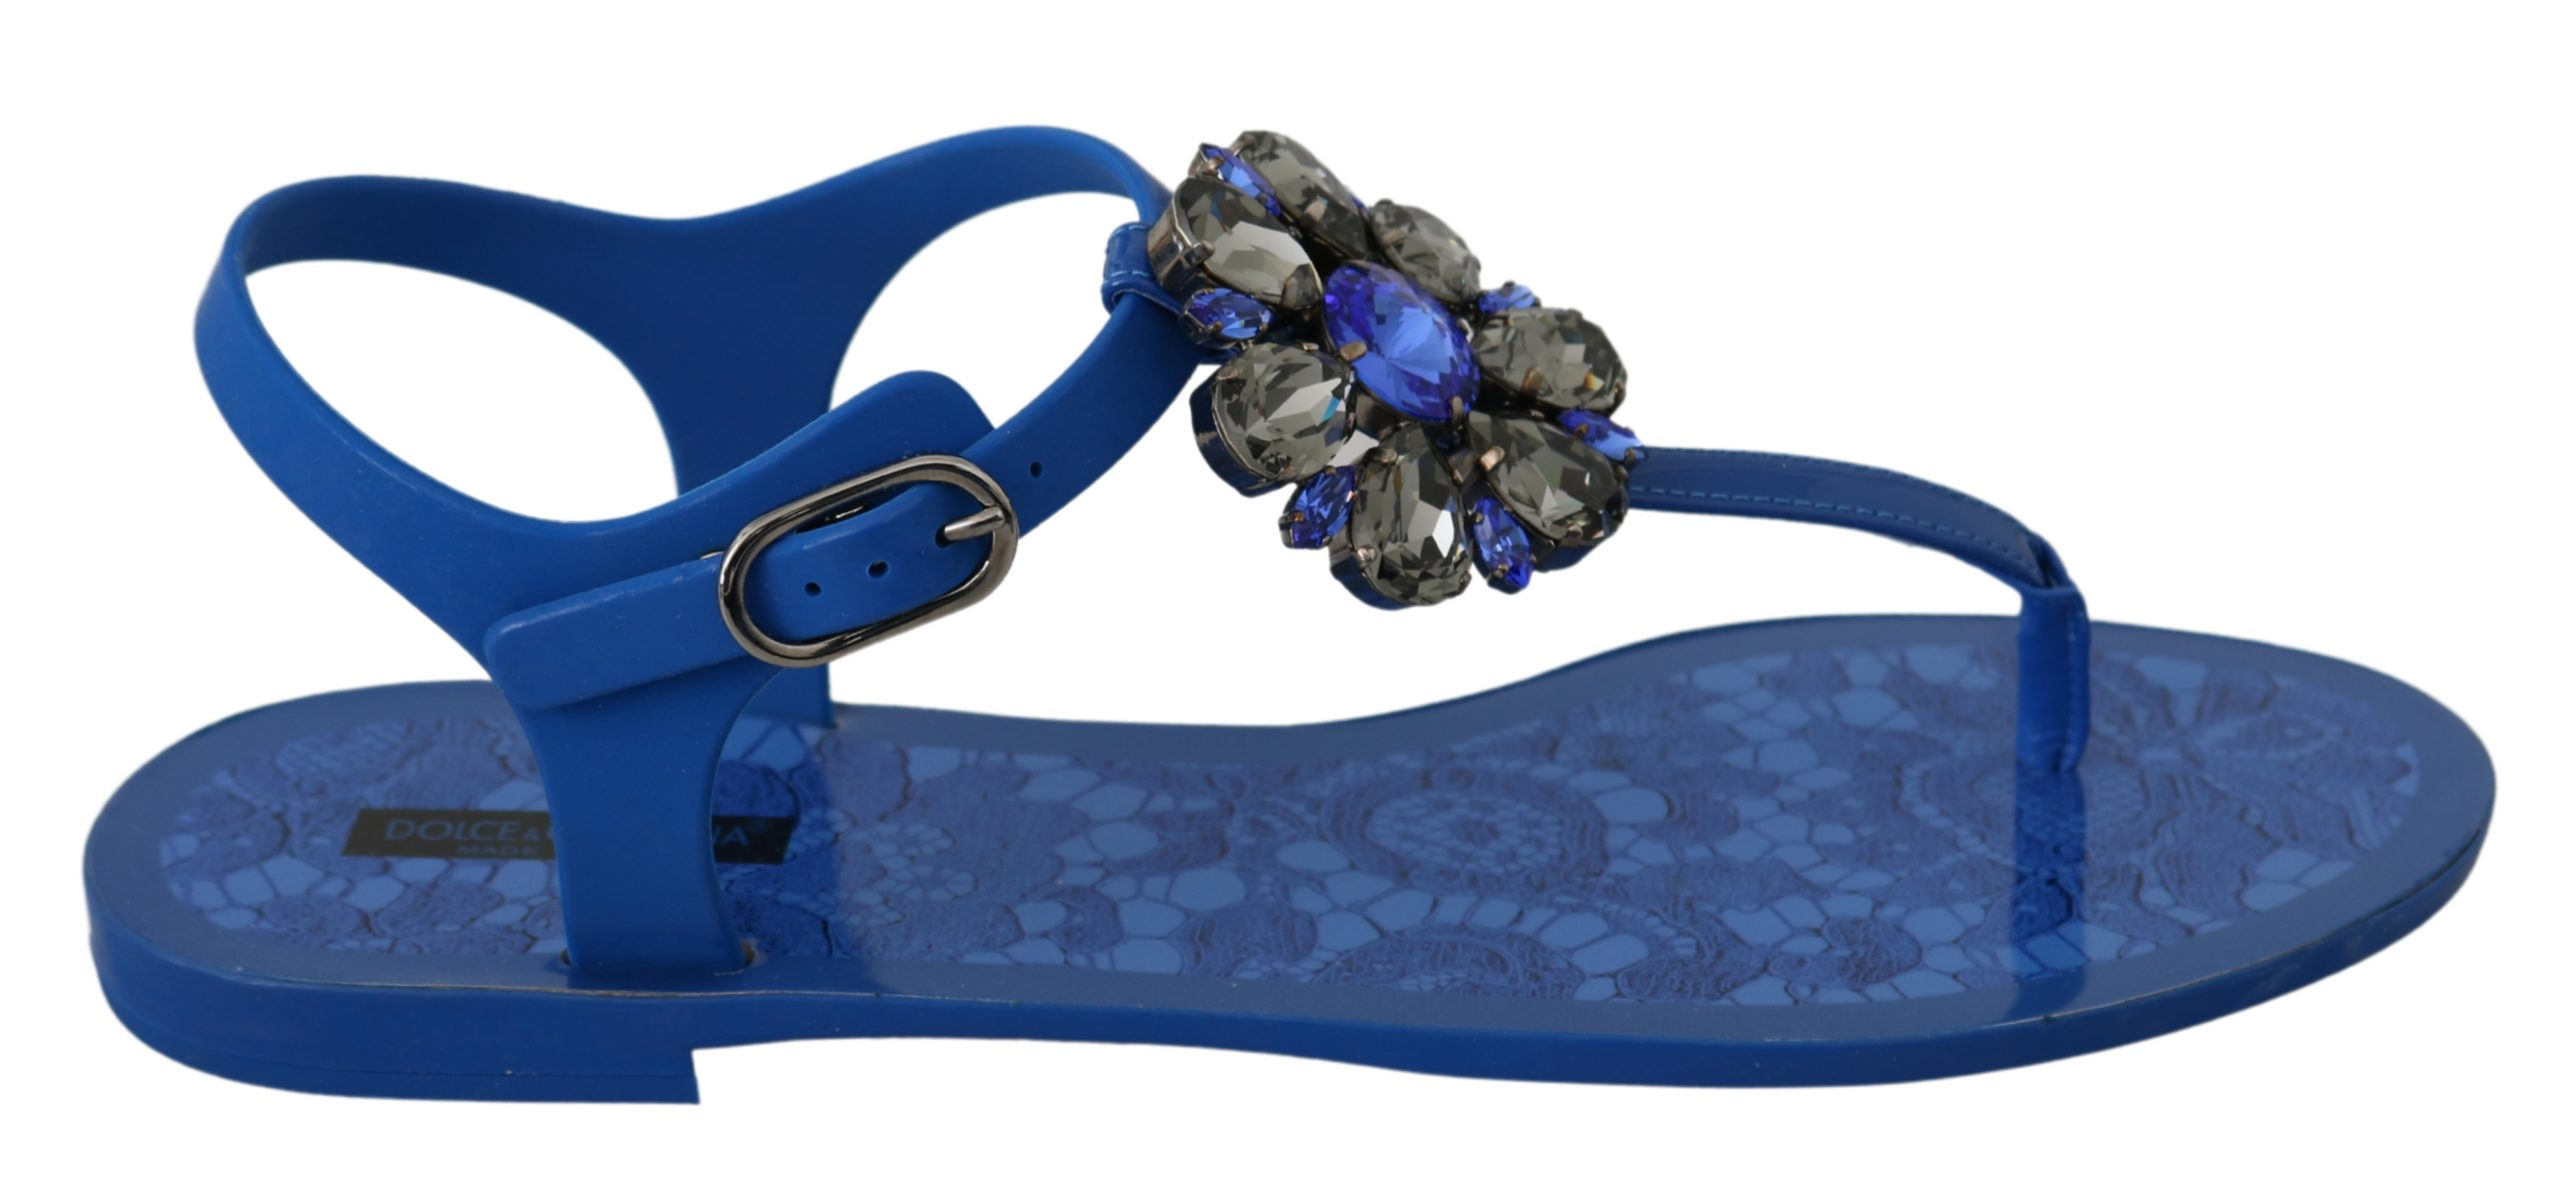 Dolce & Gabbana Women's Crystal Sandals Blue LA6568 - EU36/US5.5